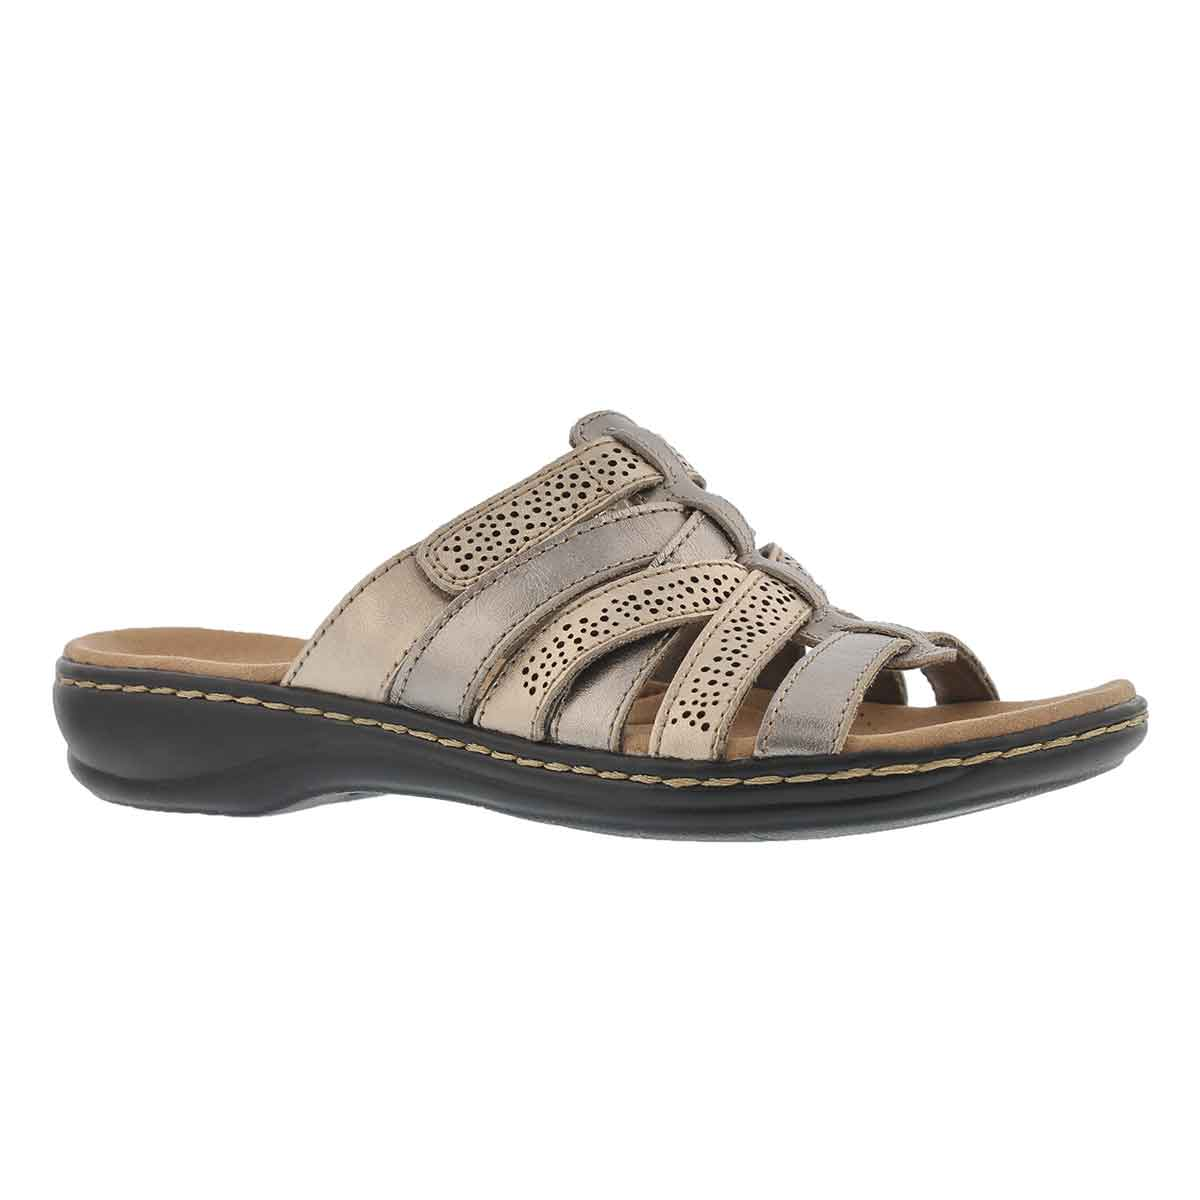 Women's LEISA FIELD metallic casual slide sandals